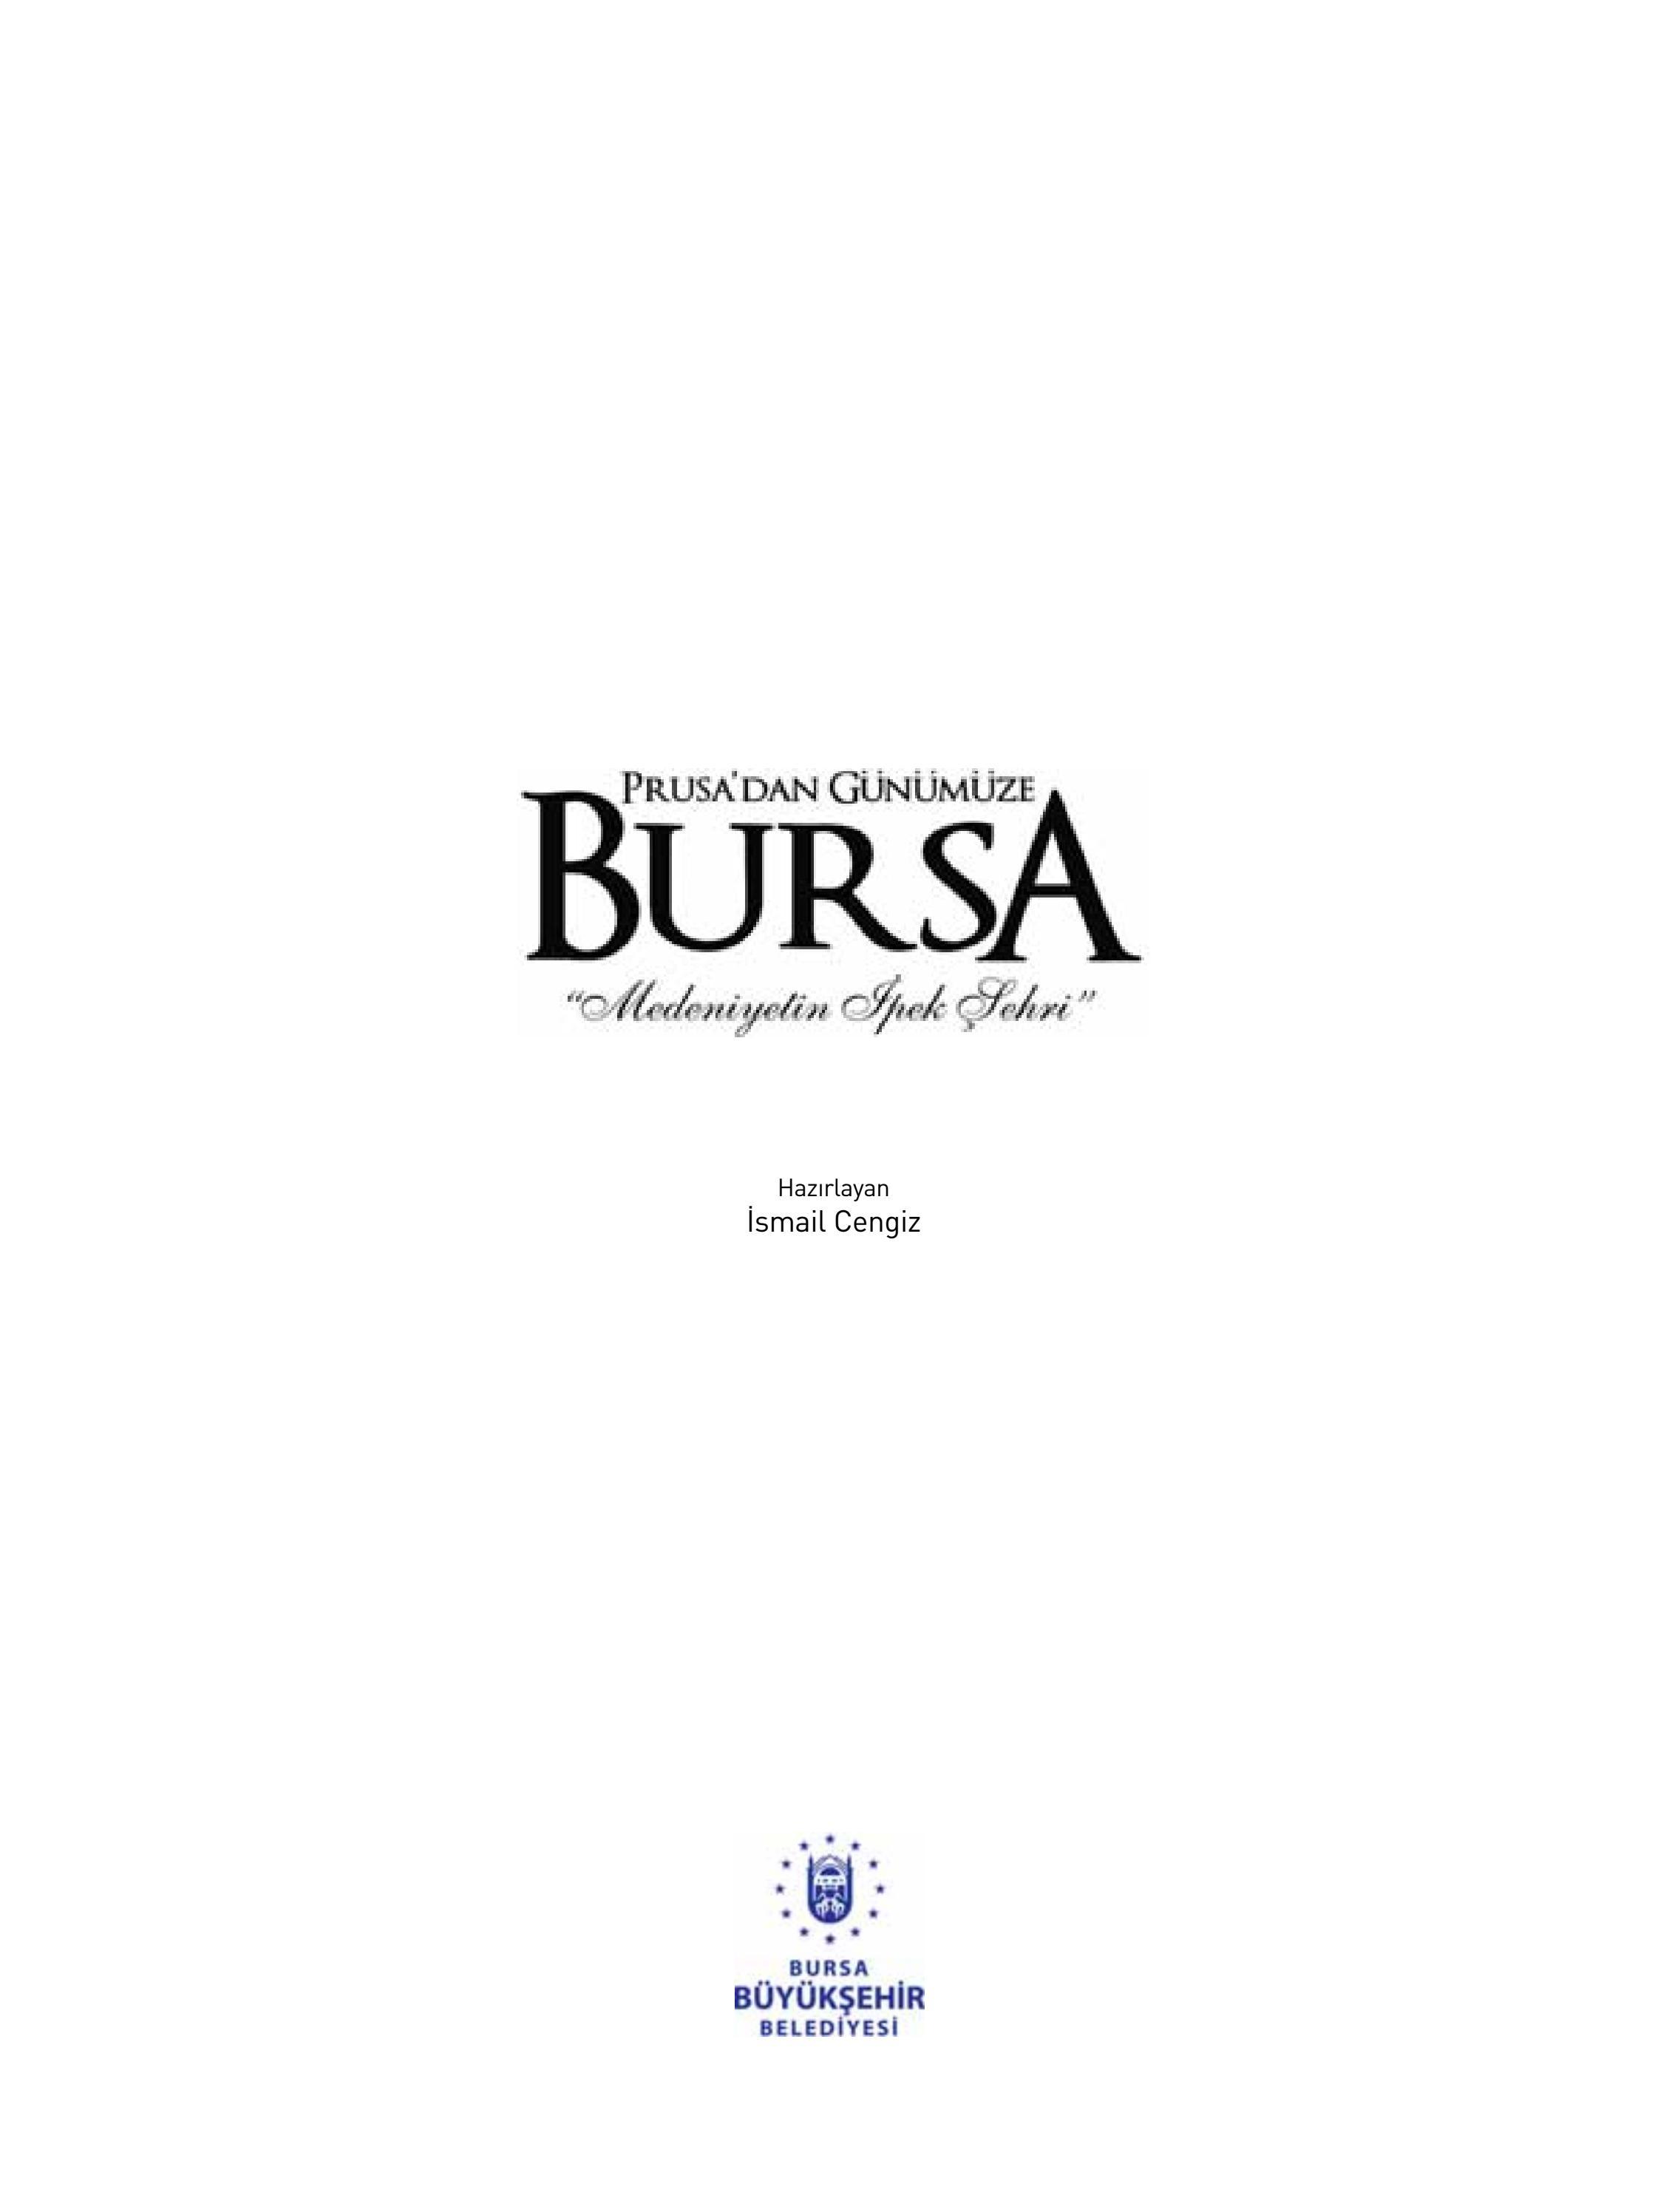 Prusadan Bursaya Bursa Kitabi By 3dbursa Com Issuu